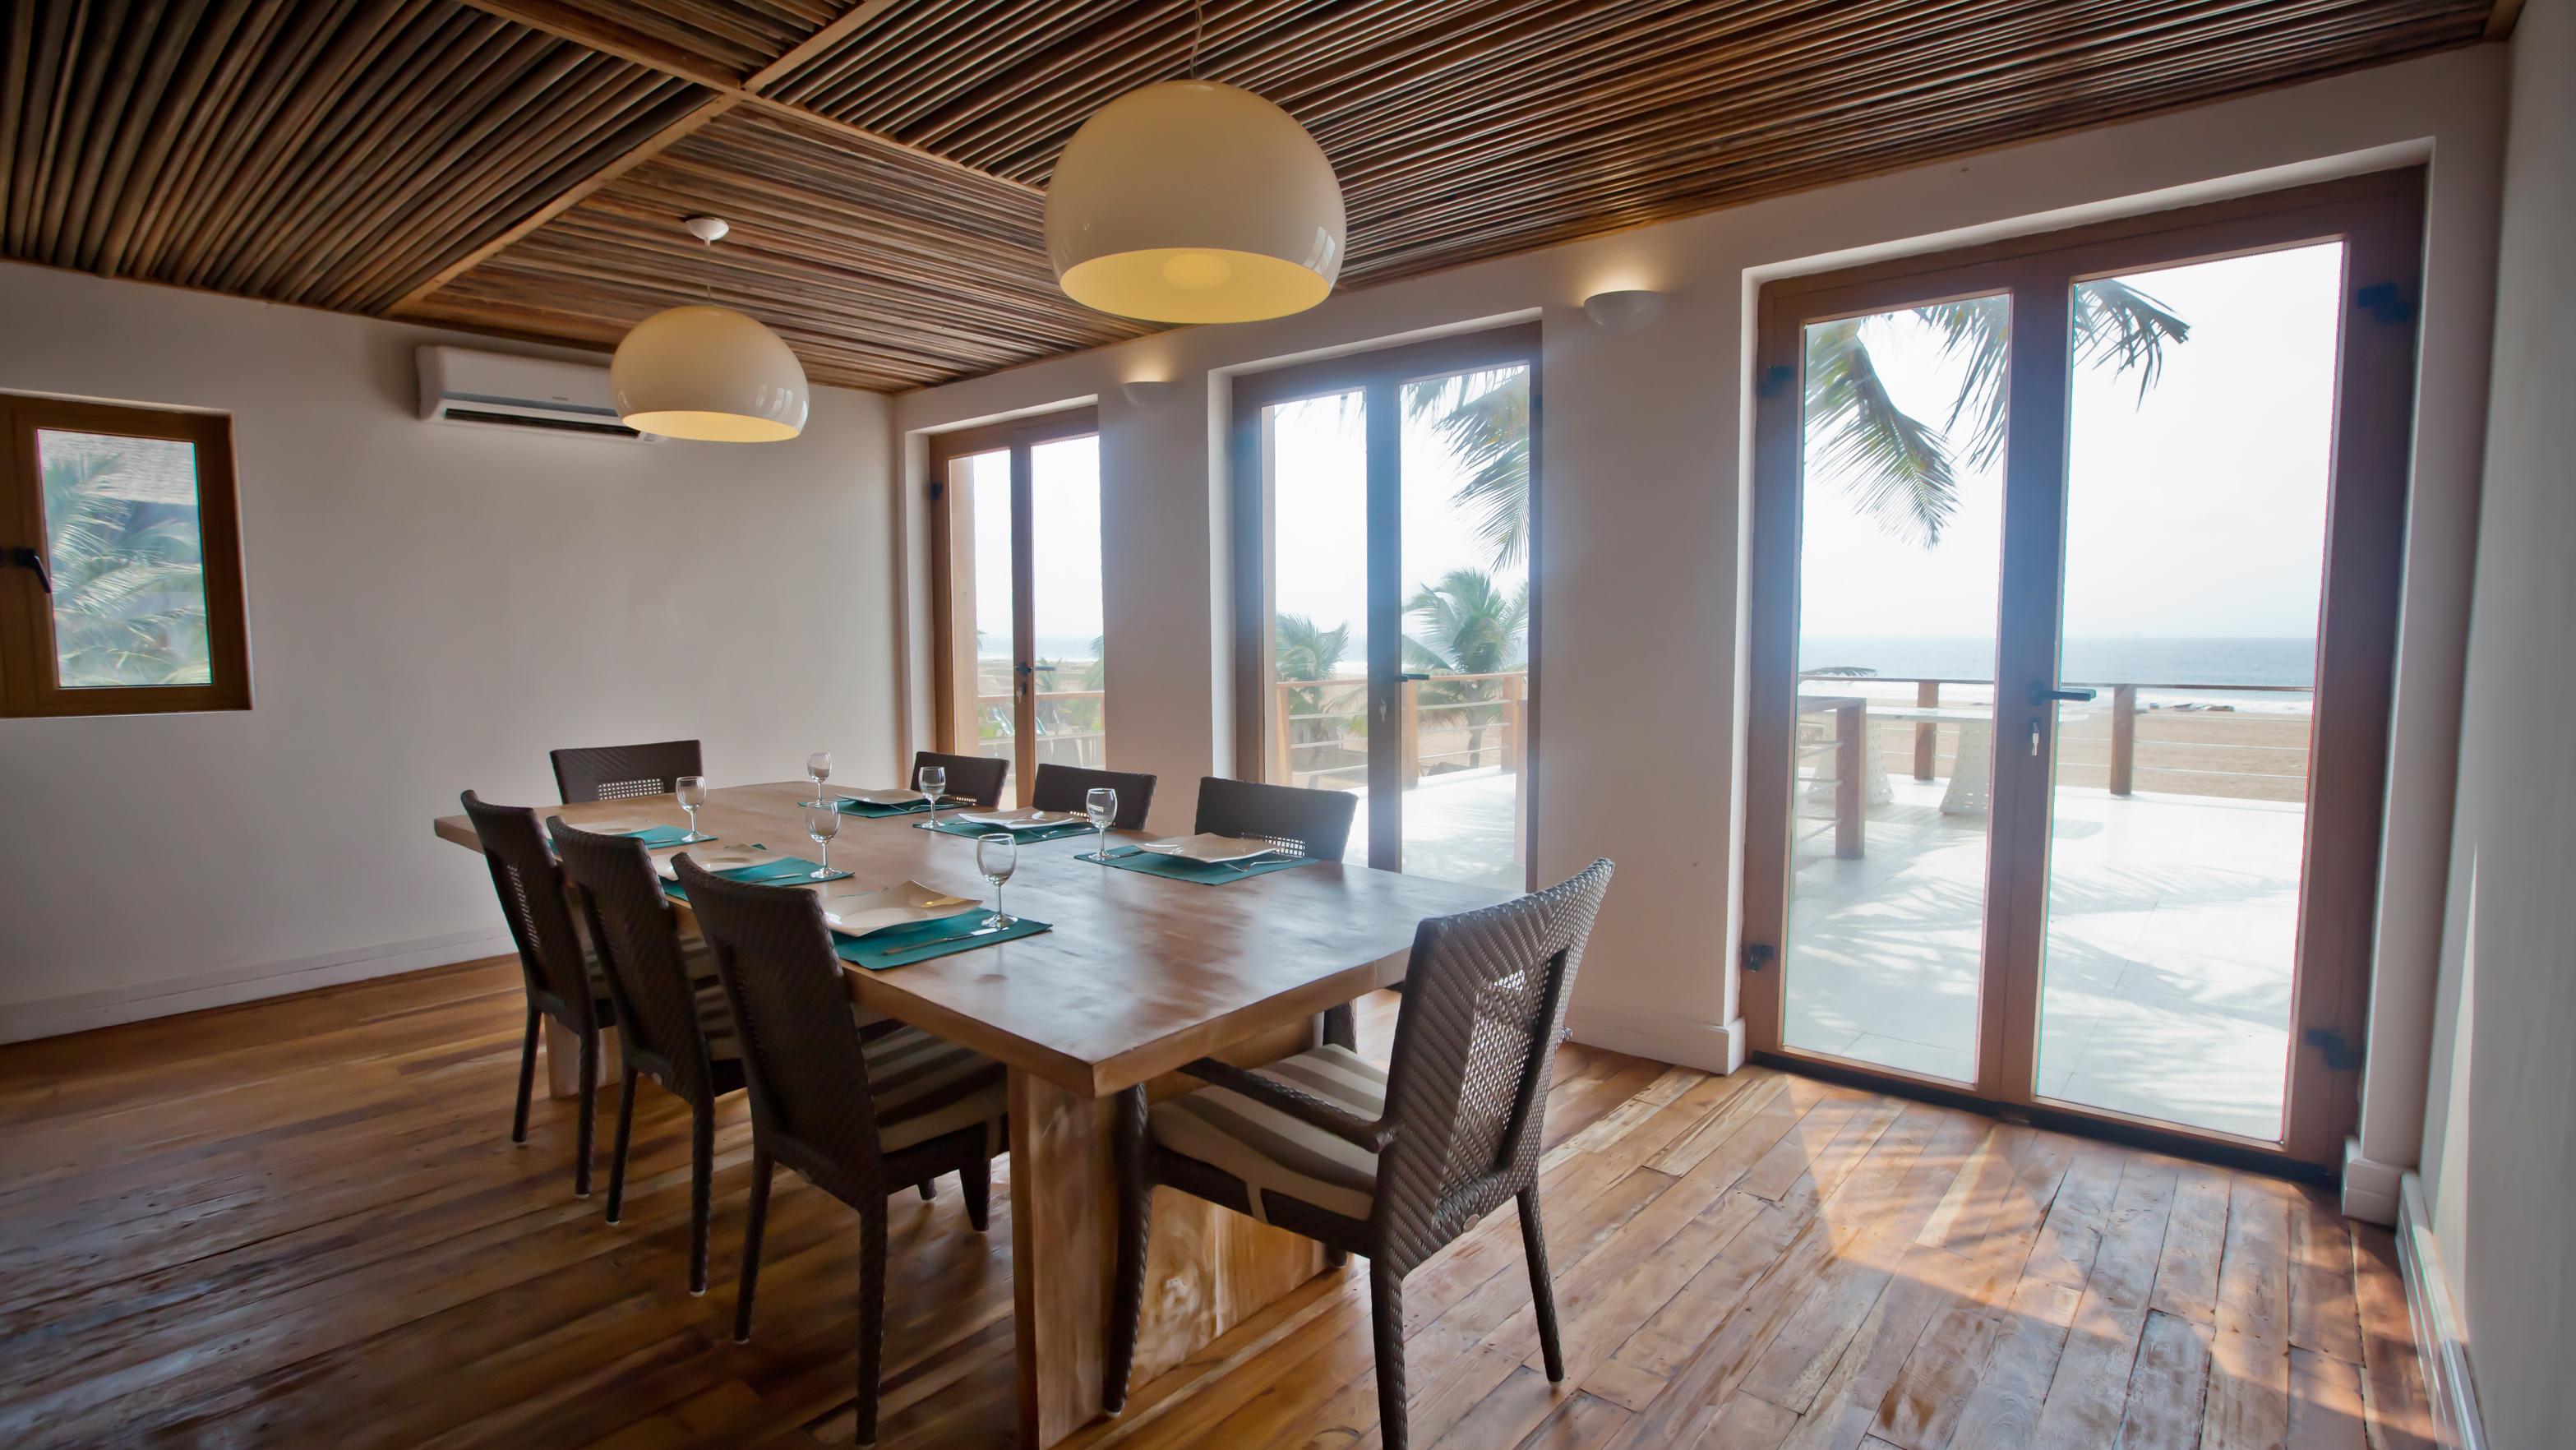 PRIVATE BEACH HOUSE INTERIOR 4